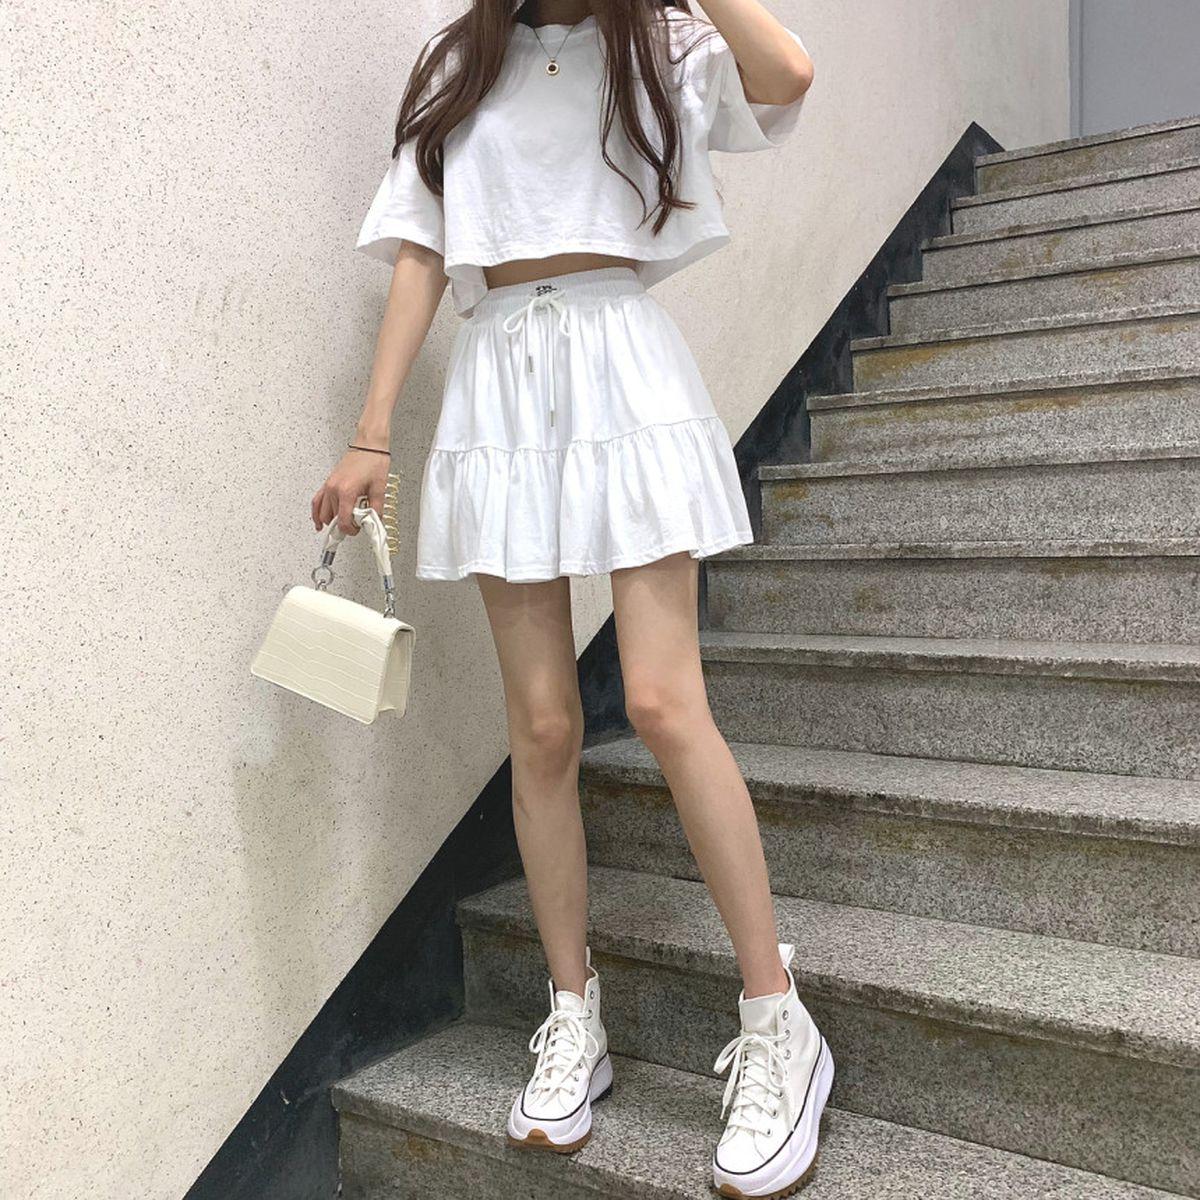 [SET]クロップ半袖Tシャツ+フリルゴムスカパン